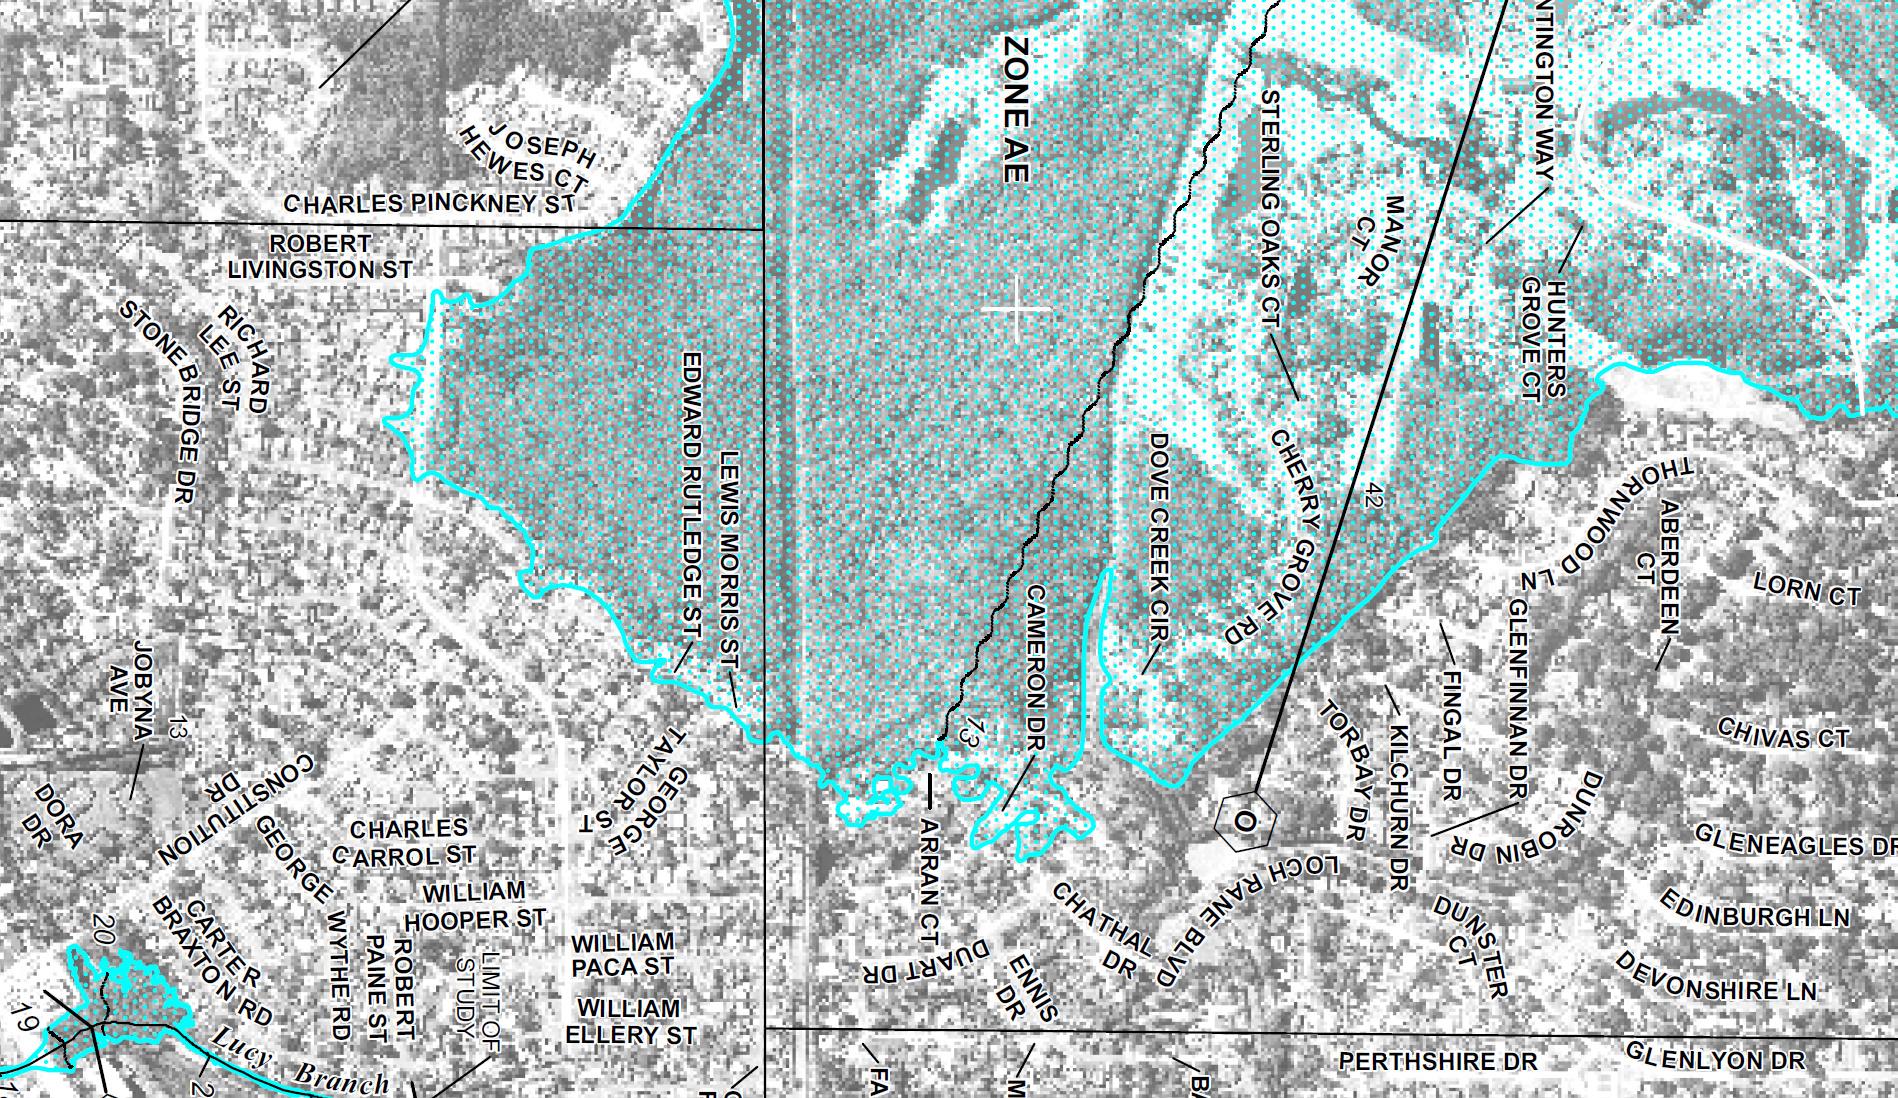 Fema Flood Zone Maps New FEMA Flood map   Loch Rane Neighborhood in Orange Park, FL Fema Flood Zone Maps